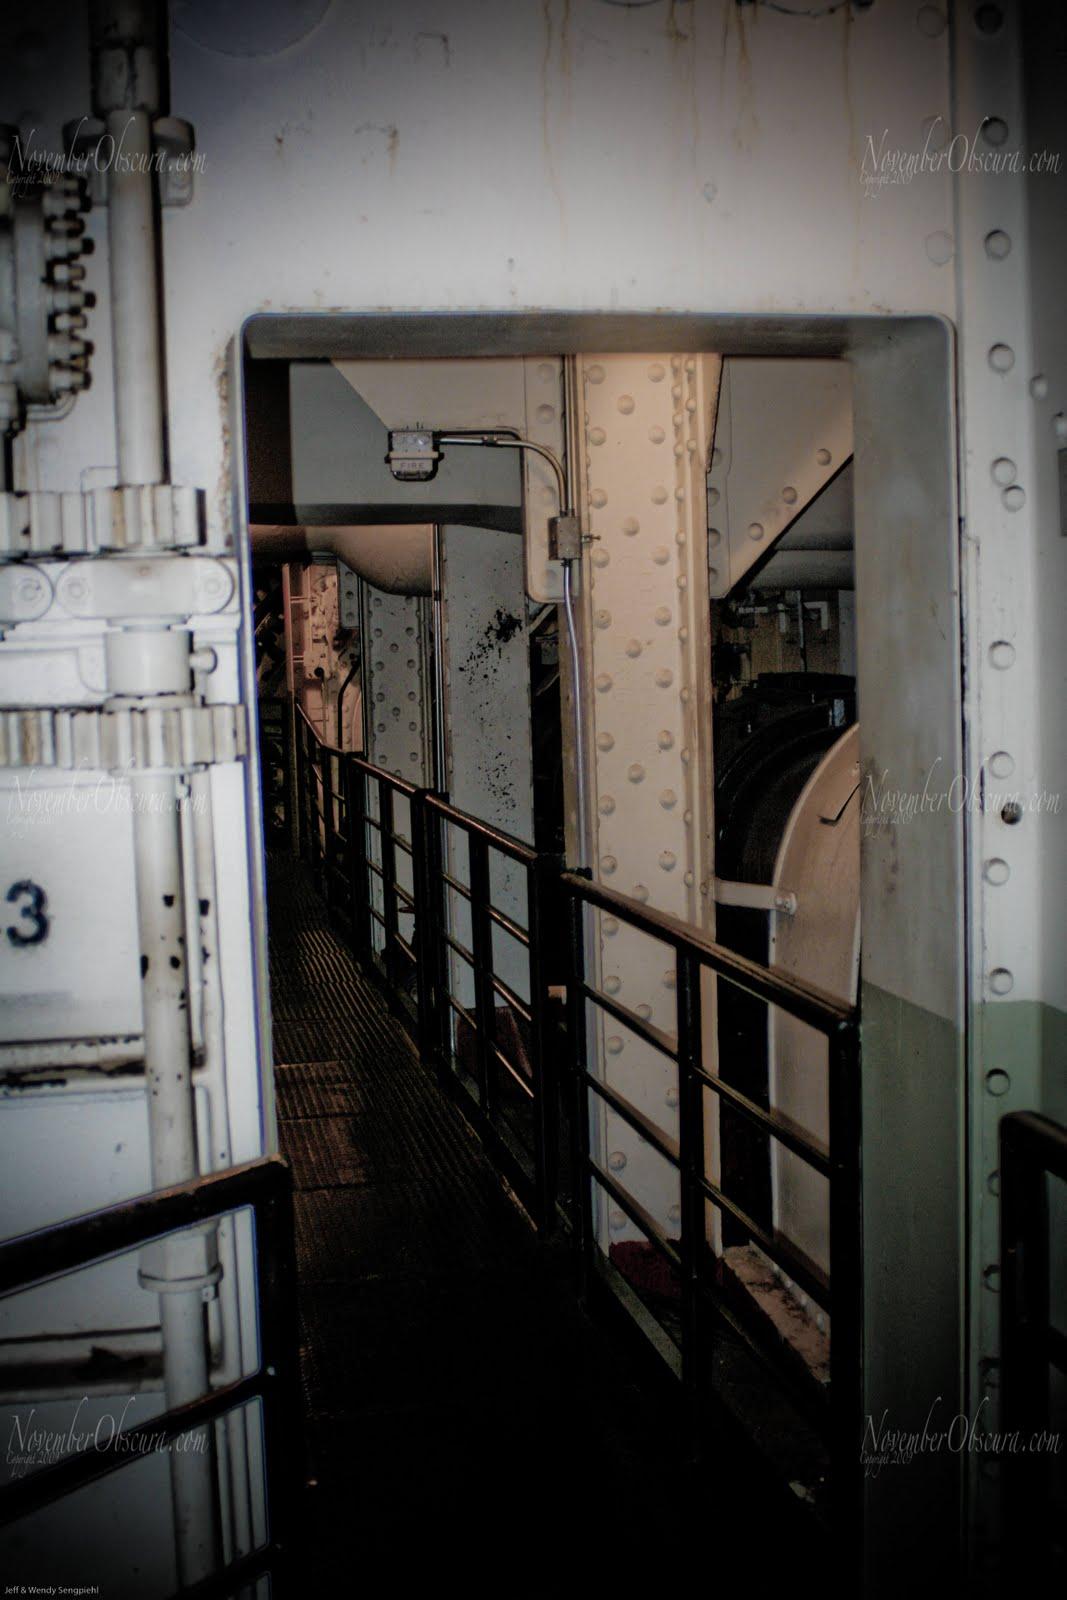 November obscura hatch 13 ghost story for 13 door